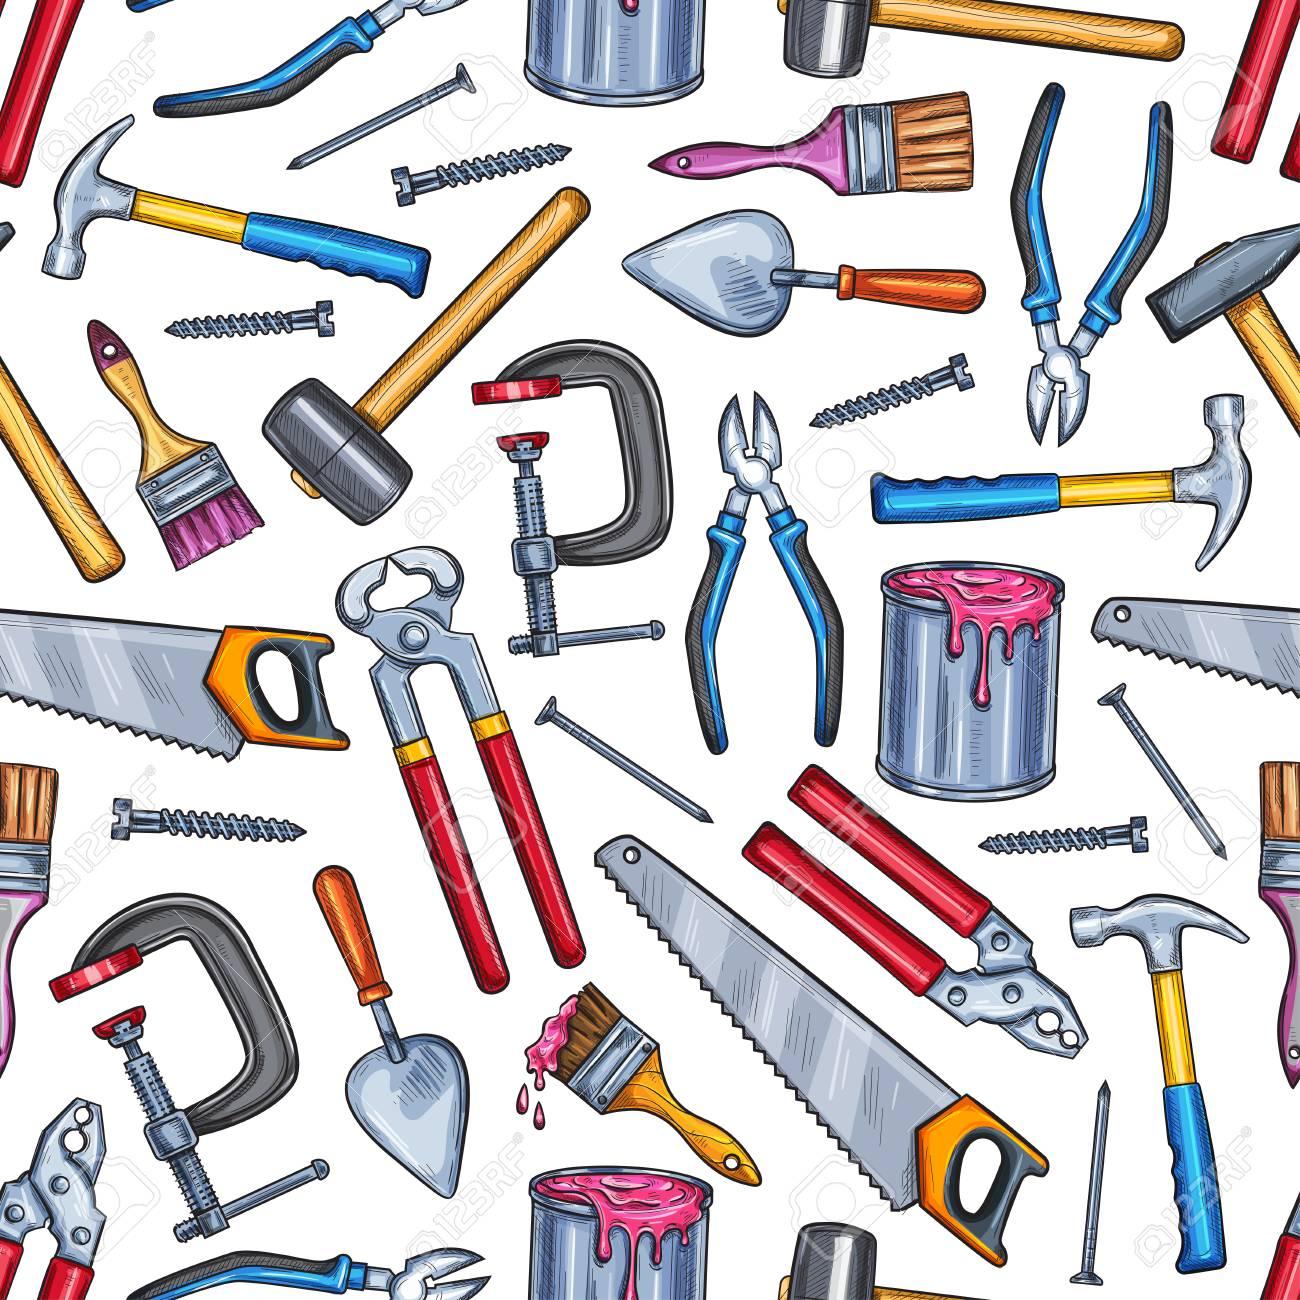 Repair work tool seamless pattern background - 104209379